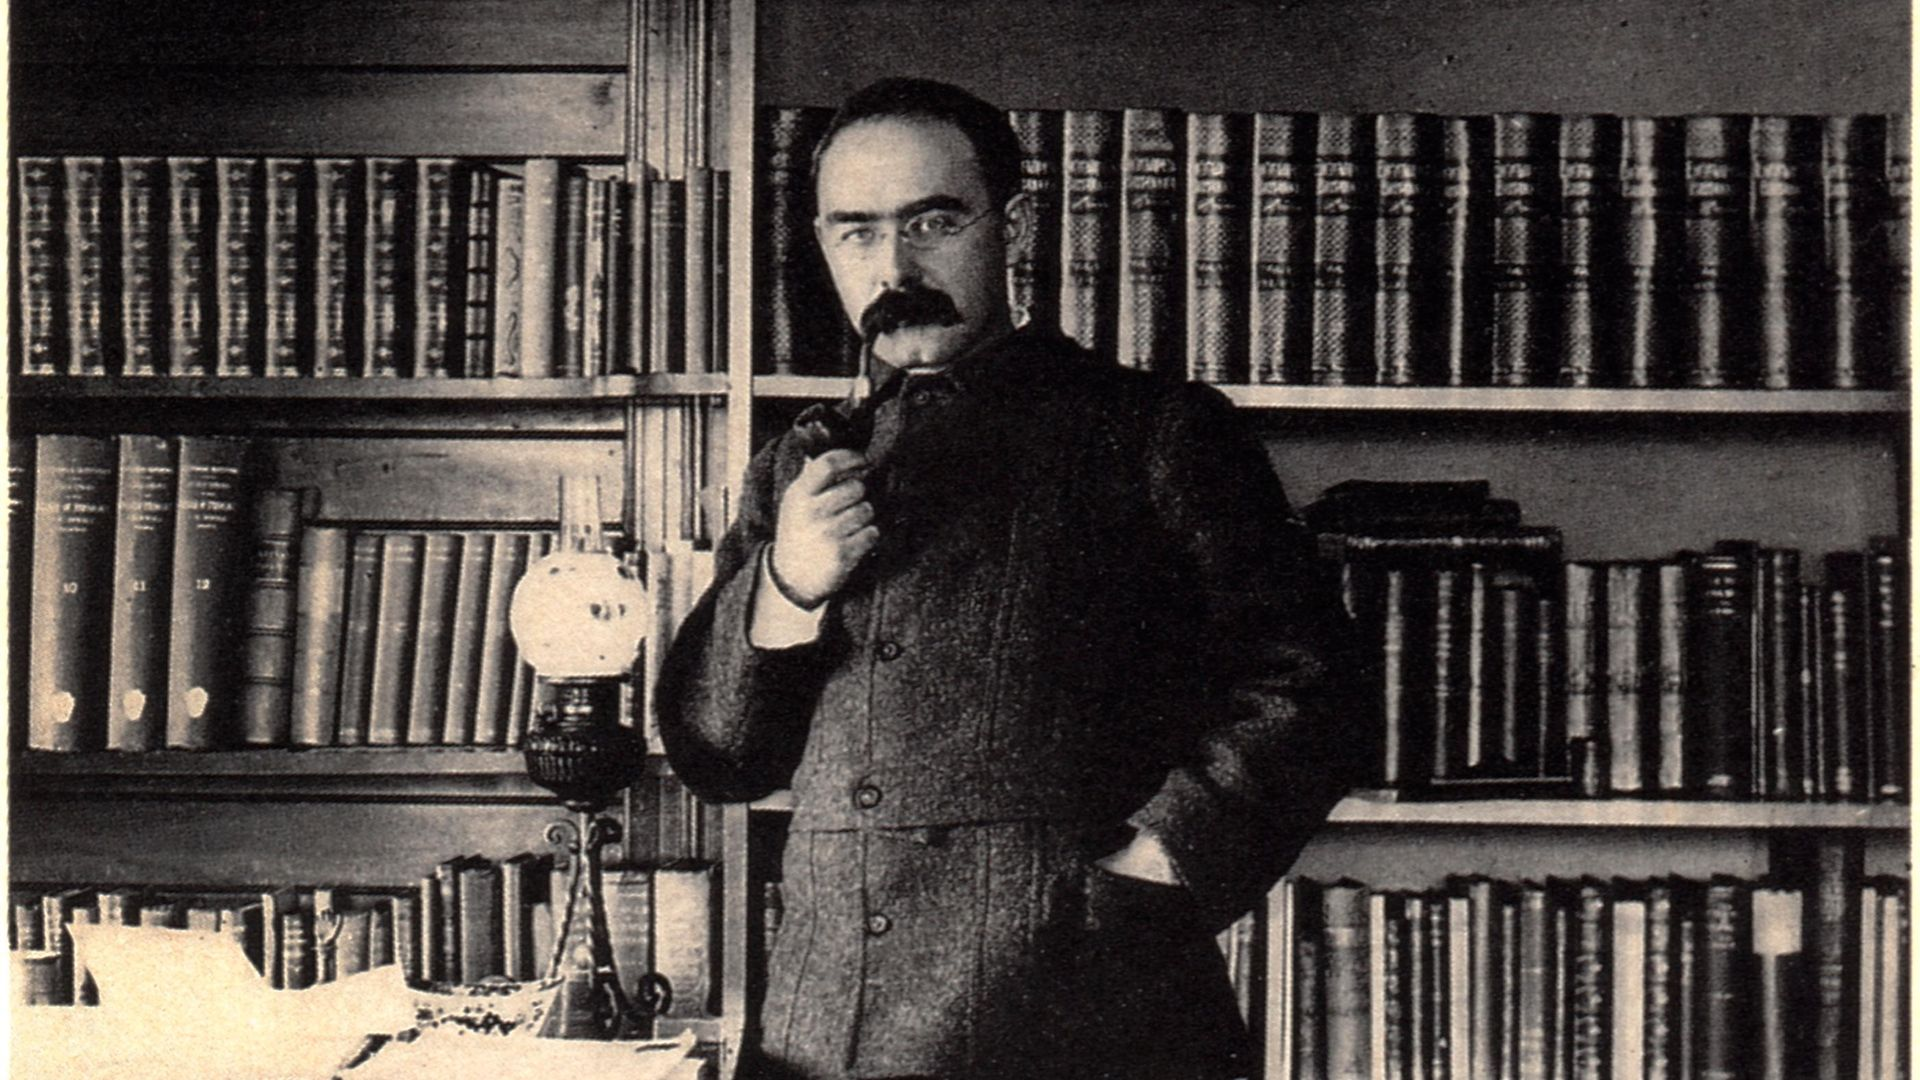 Rudyard Kipling (1865-1936) at home, circa 1895 - Credit: Universal Images Group via Getty